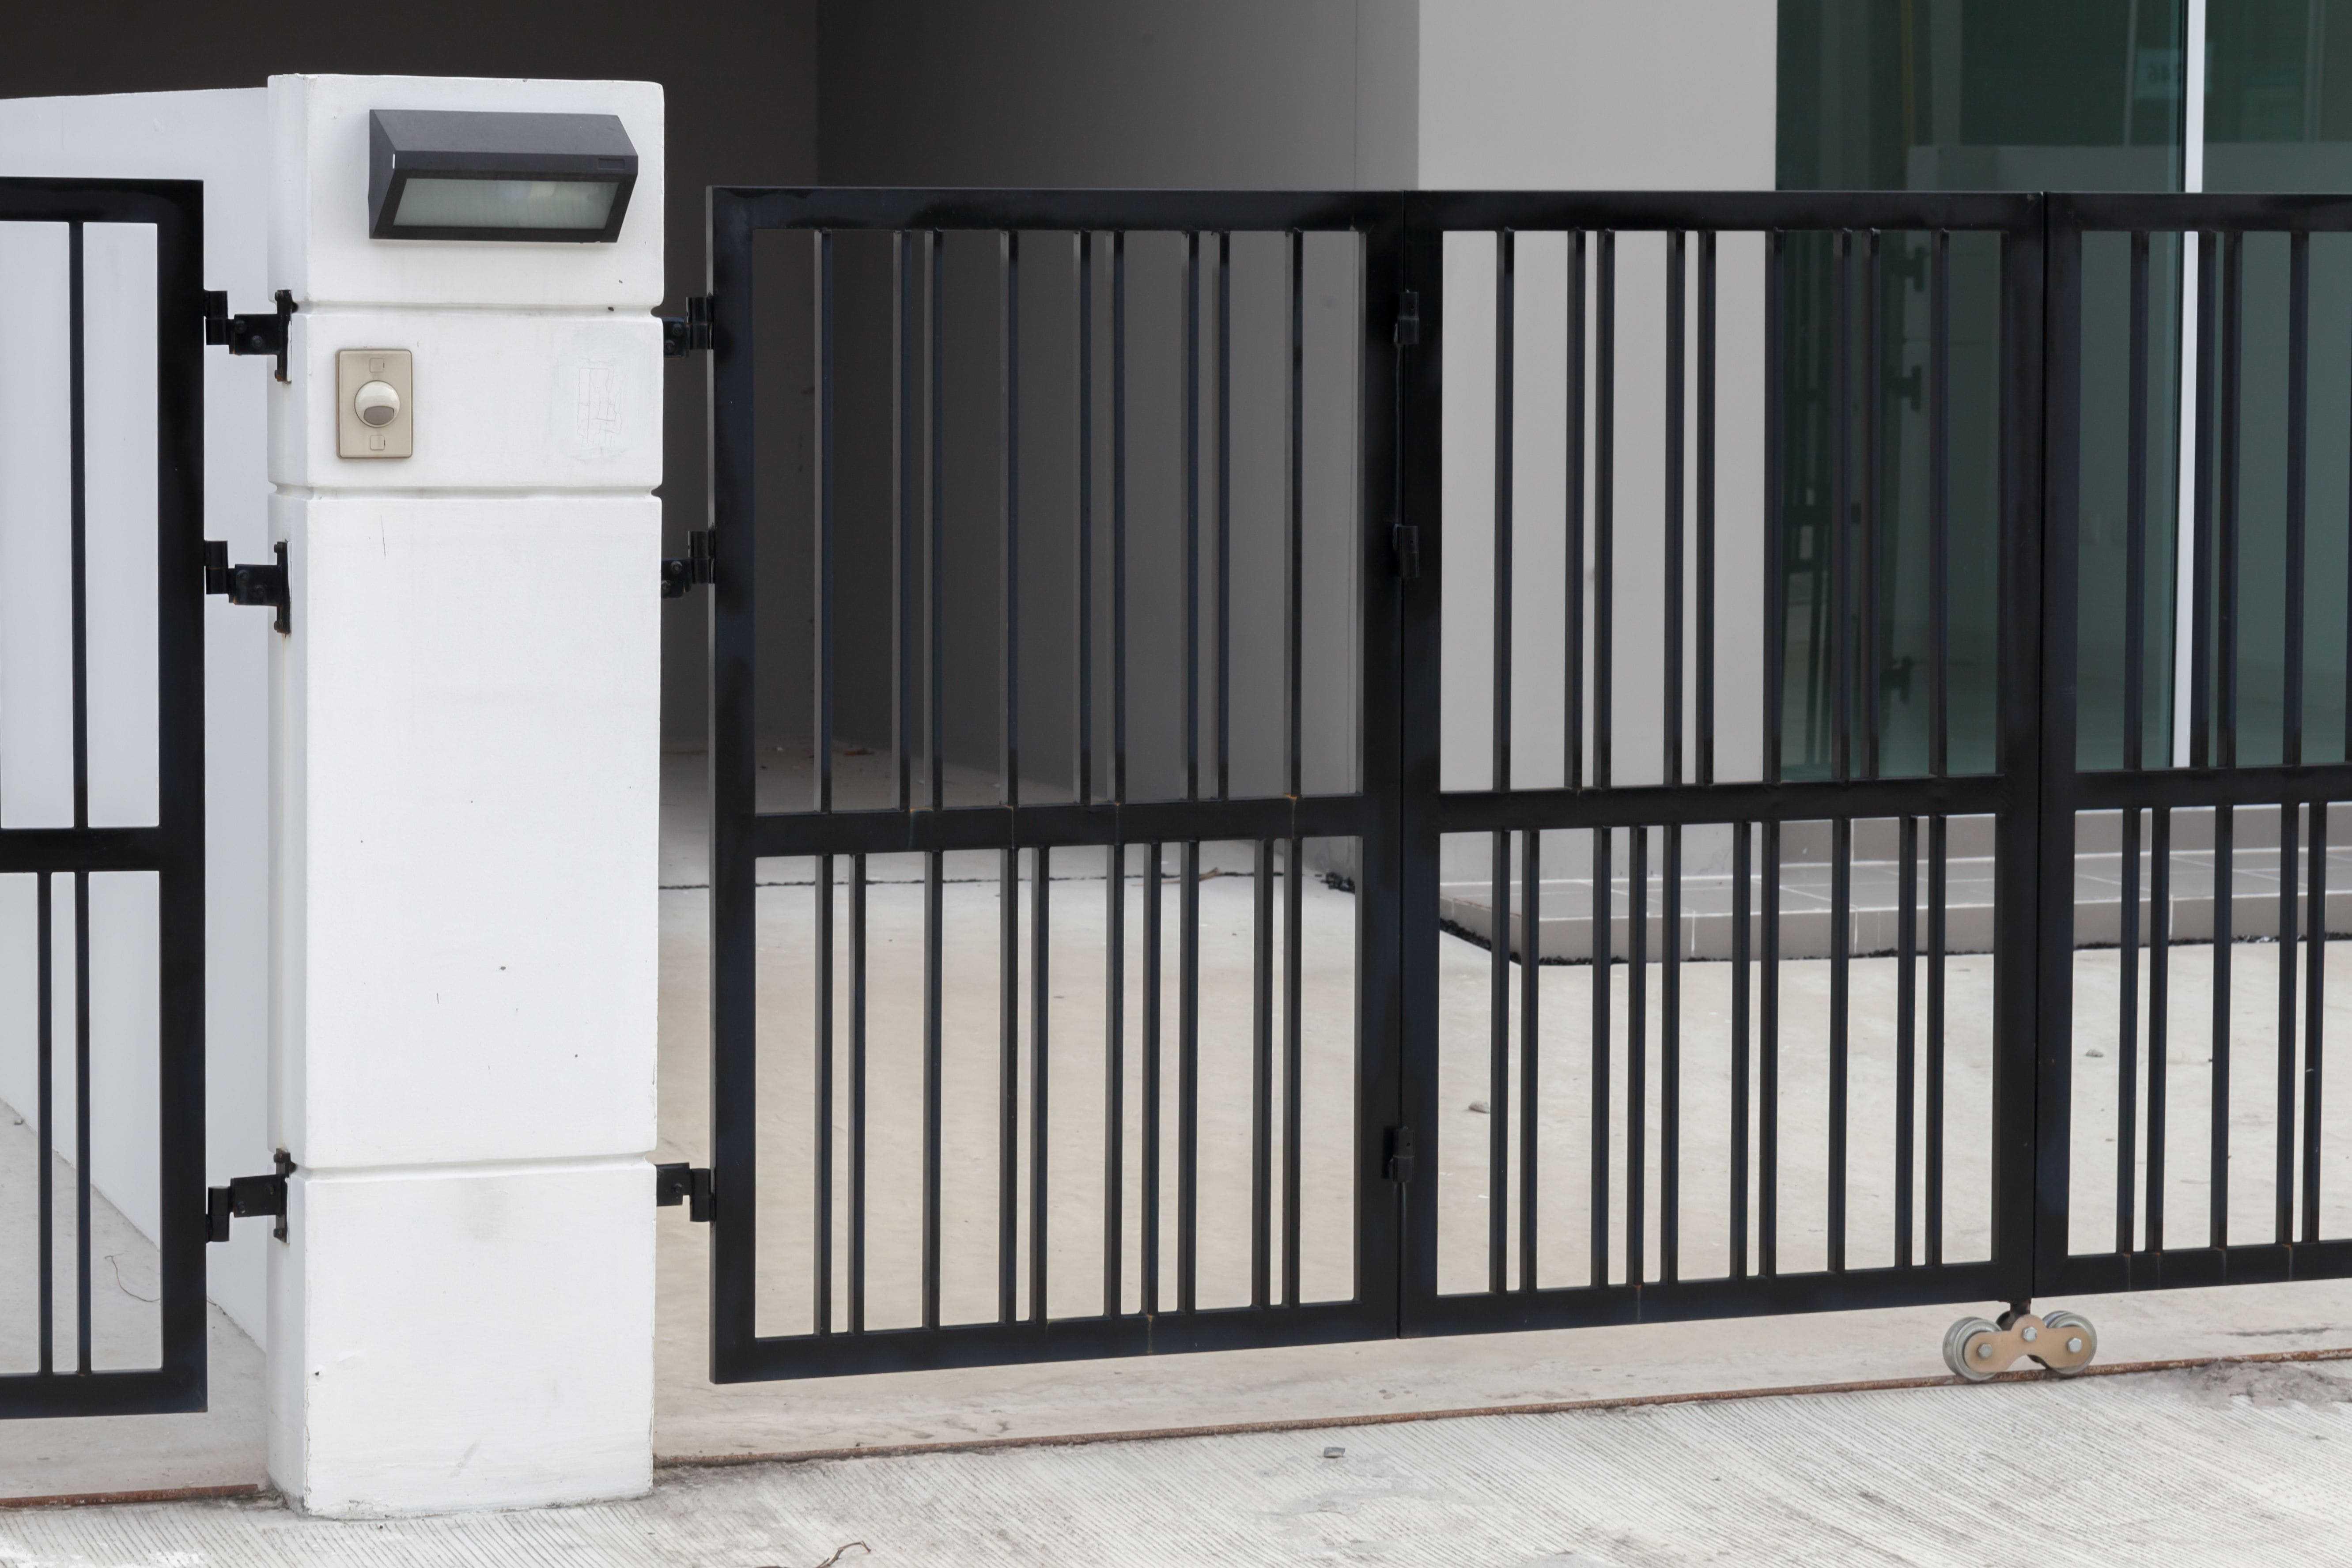 intercom doorbell system for added security